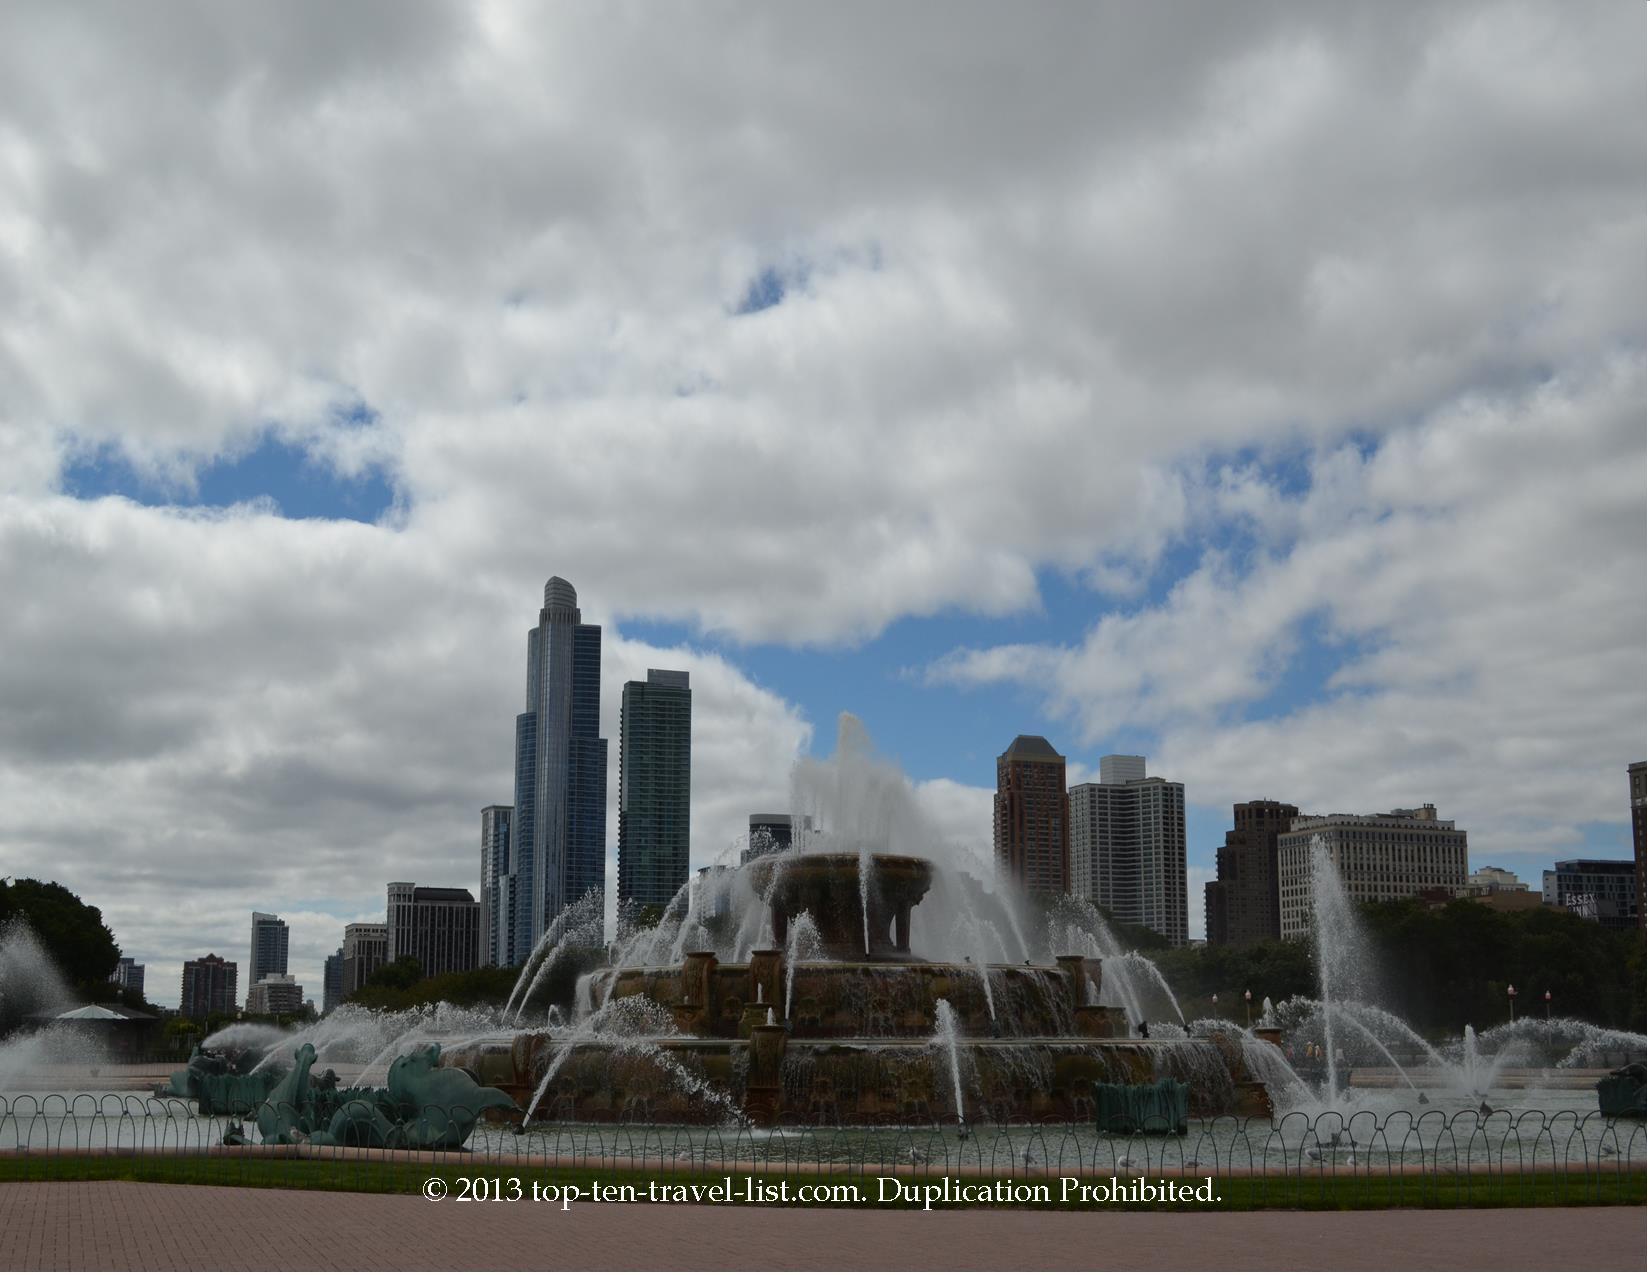 Buckingham fountain in Chicago, Illinois